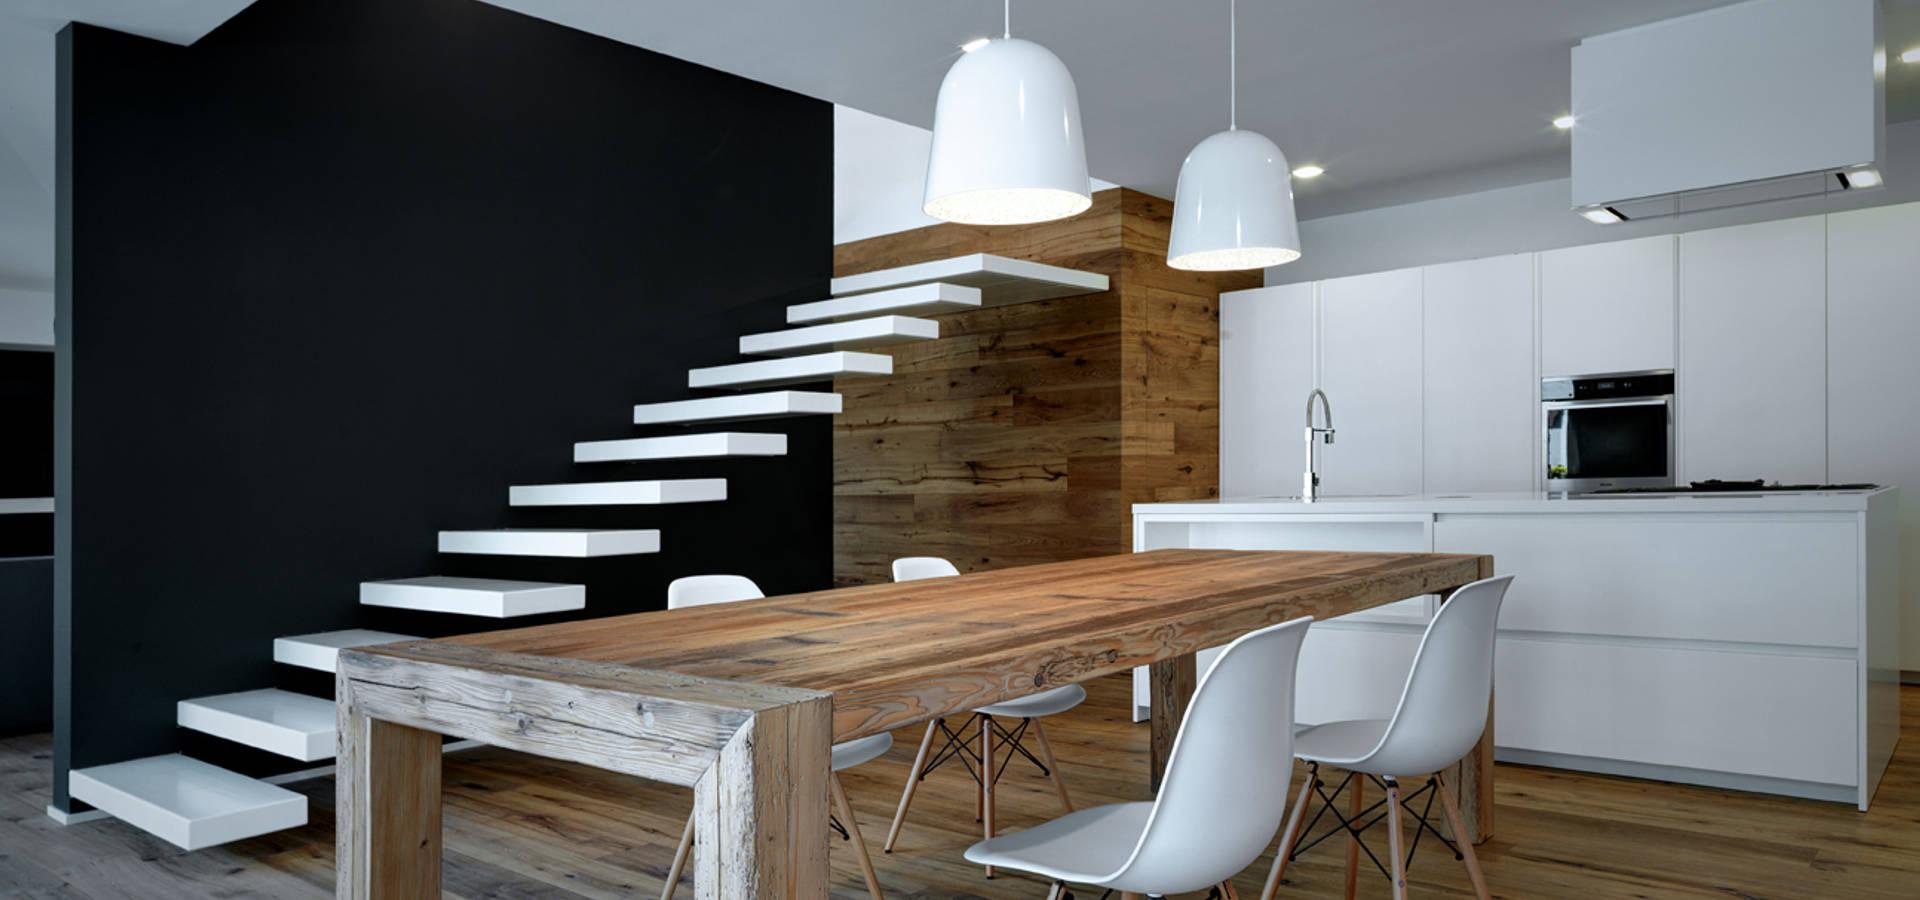 EV+A Lab Atelier d'Architettura & Interior Design